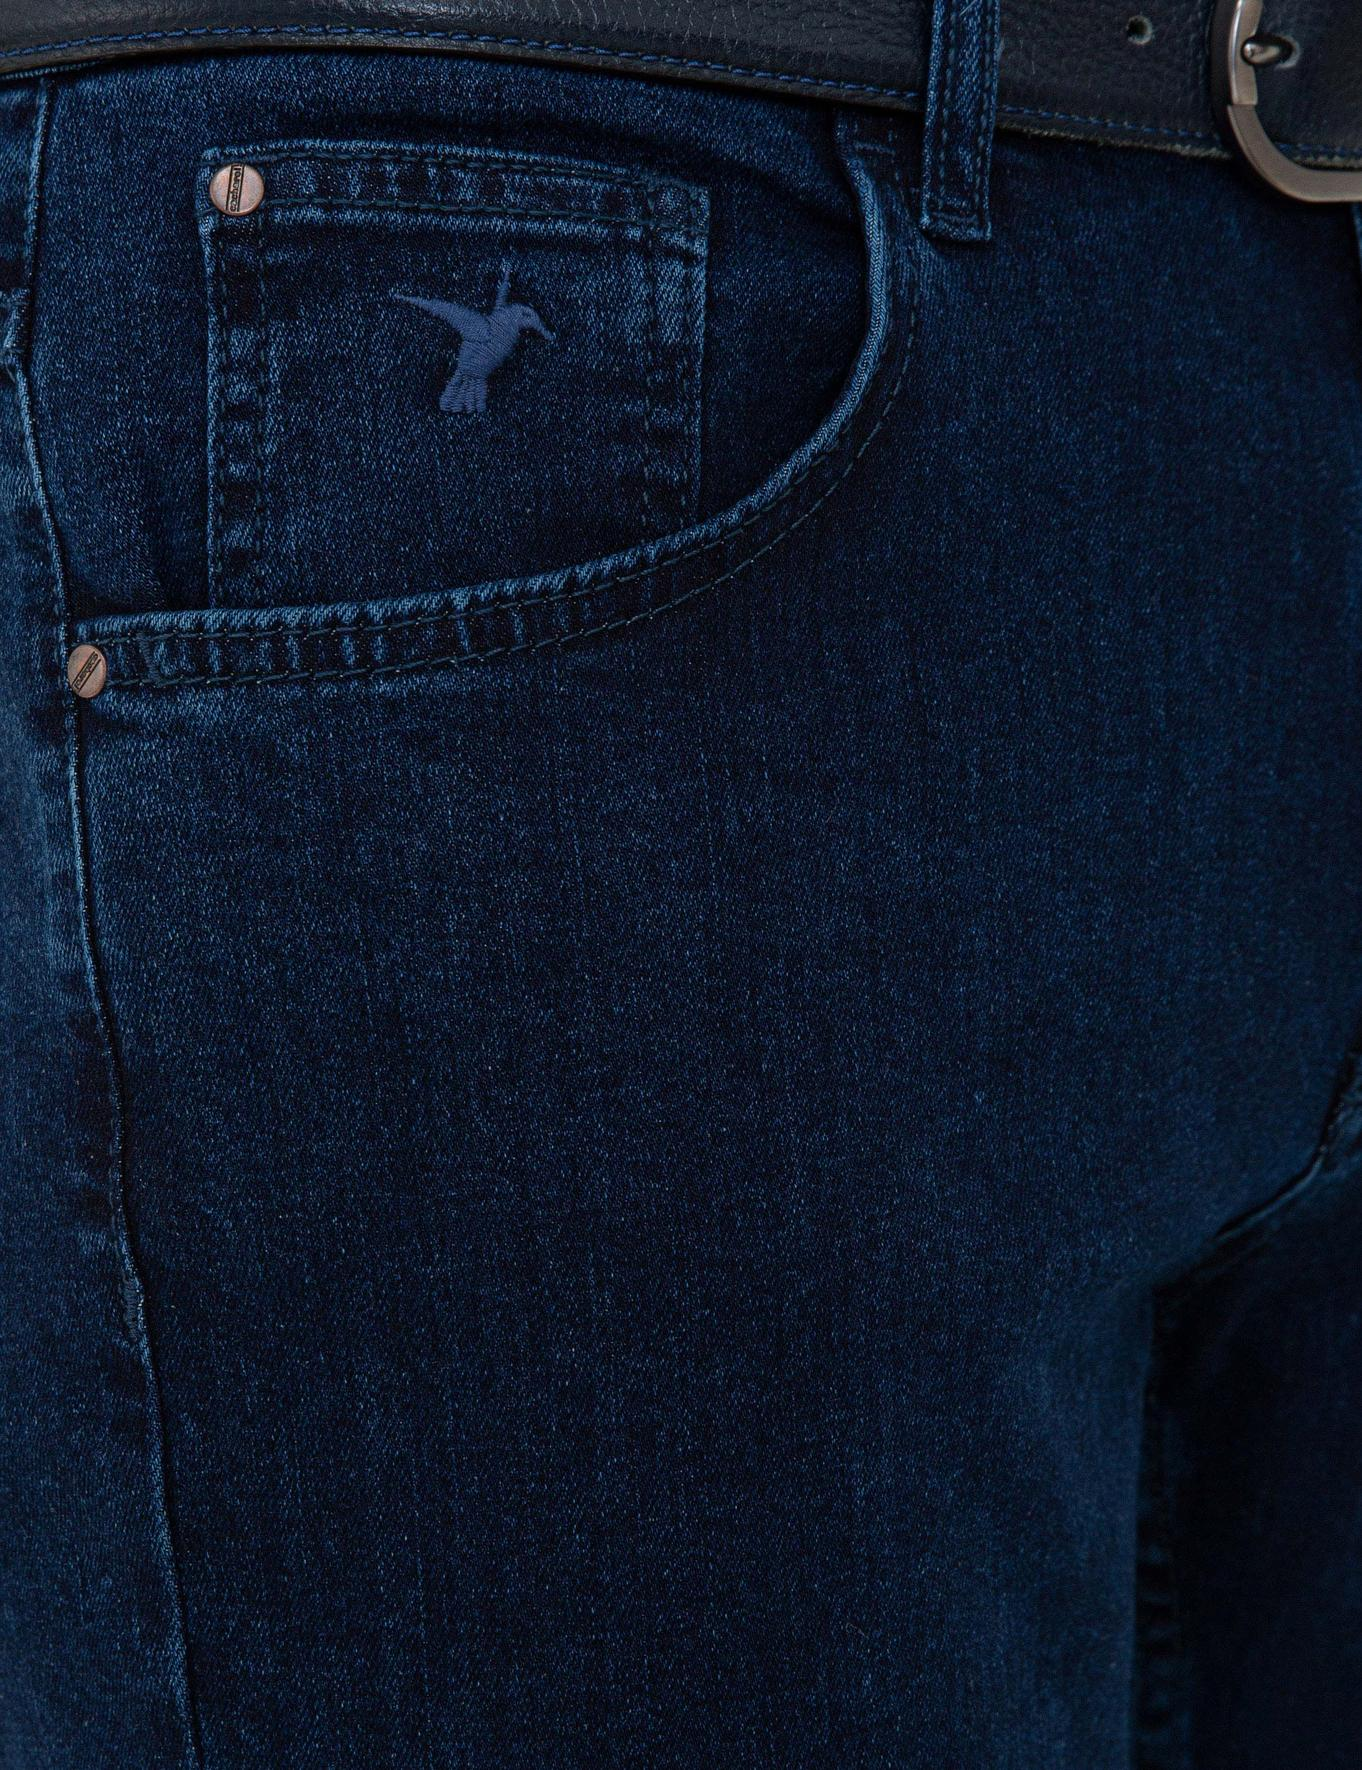 Mavi Slim Fit Denim - 50240009012